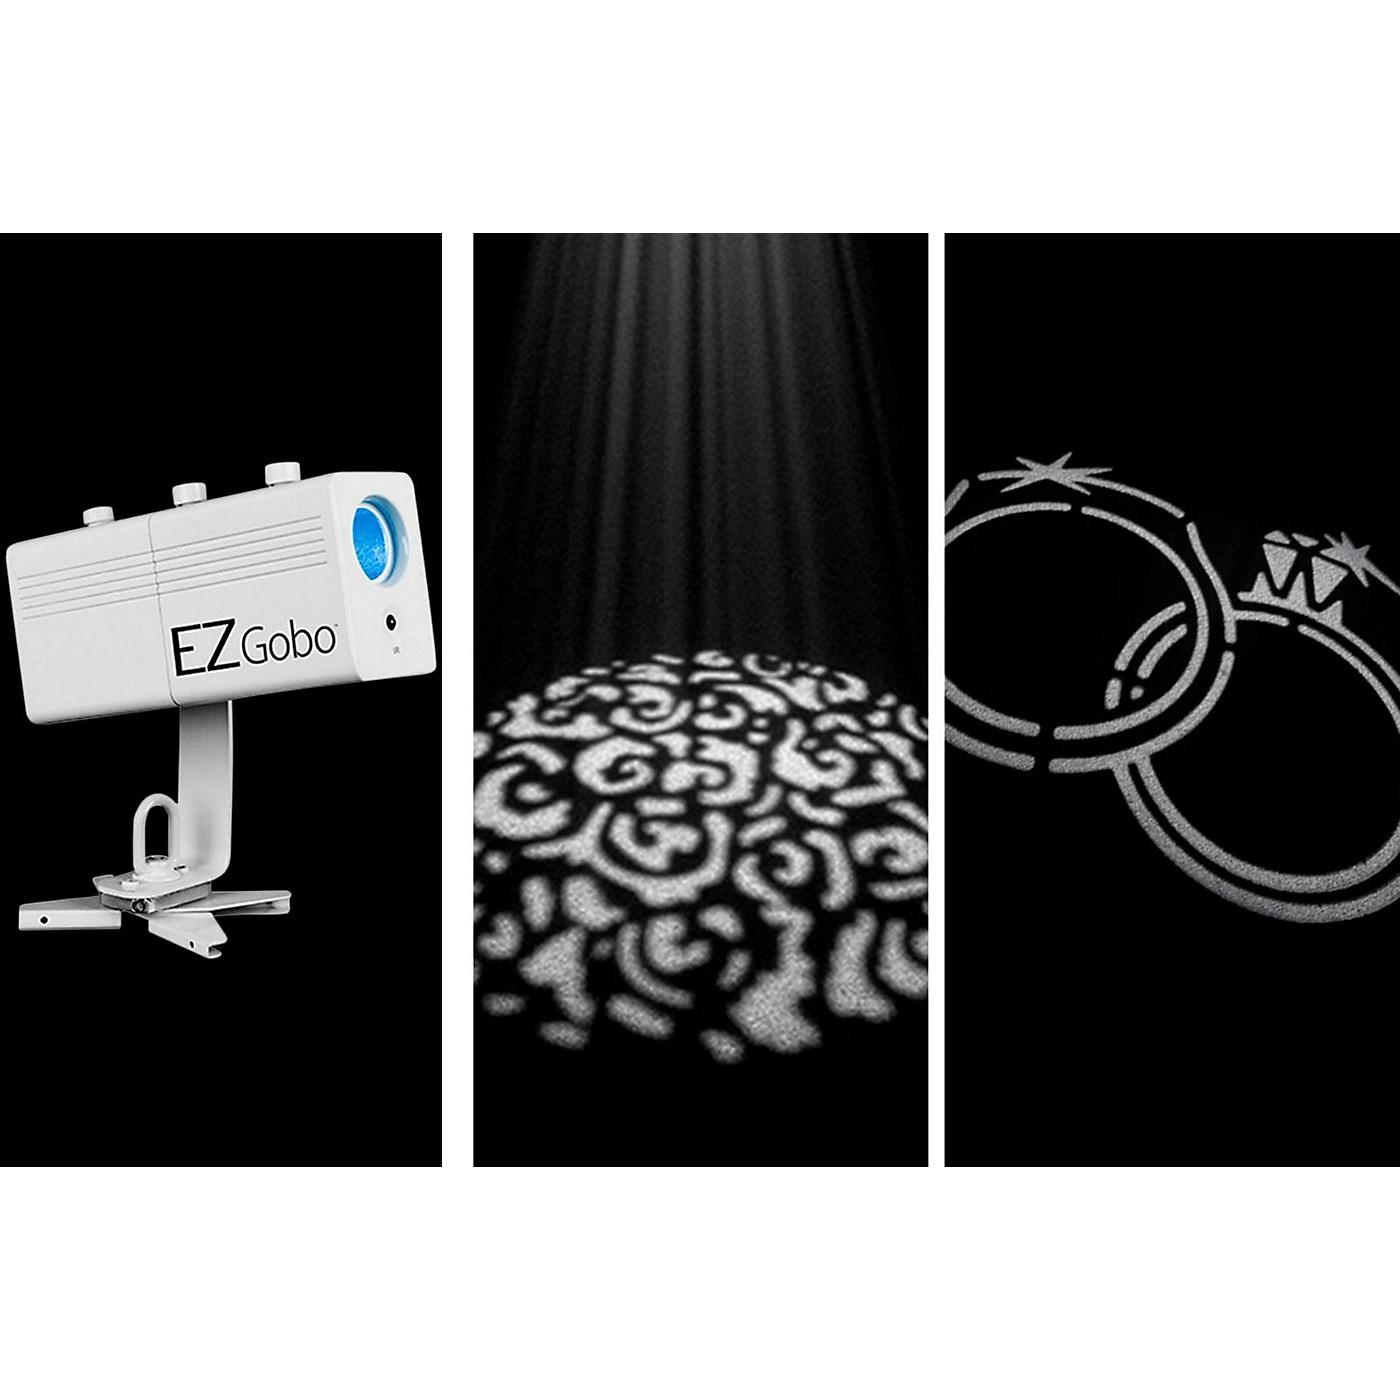 CHAUVET DJ EZGOBO LED Gobo Projection Party Effect Light thumbnail